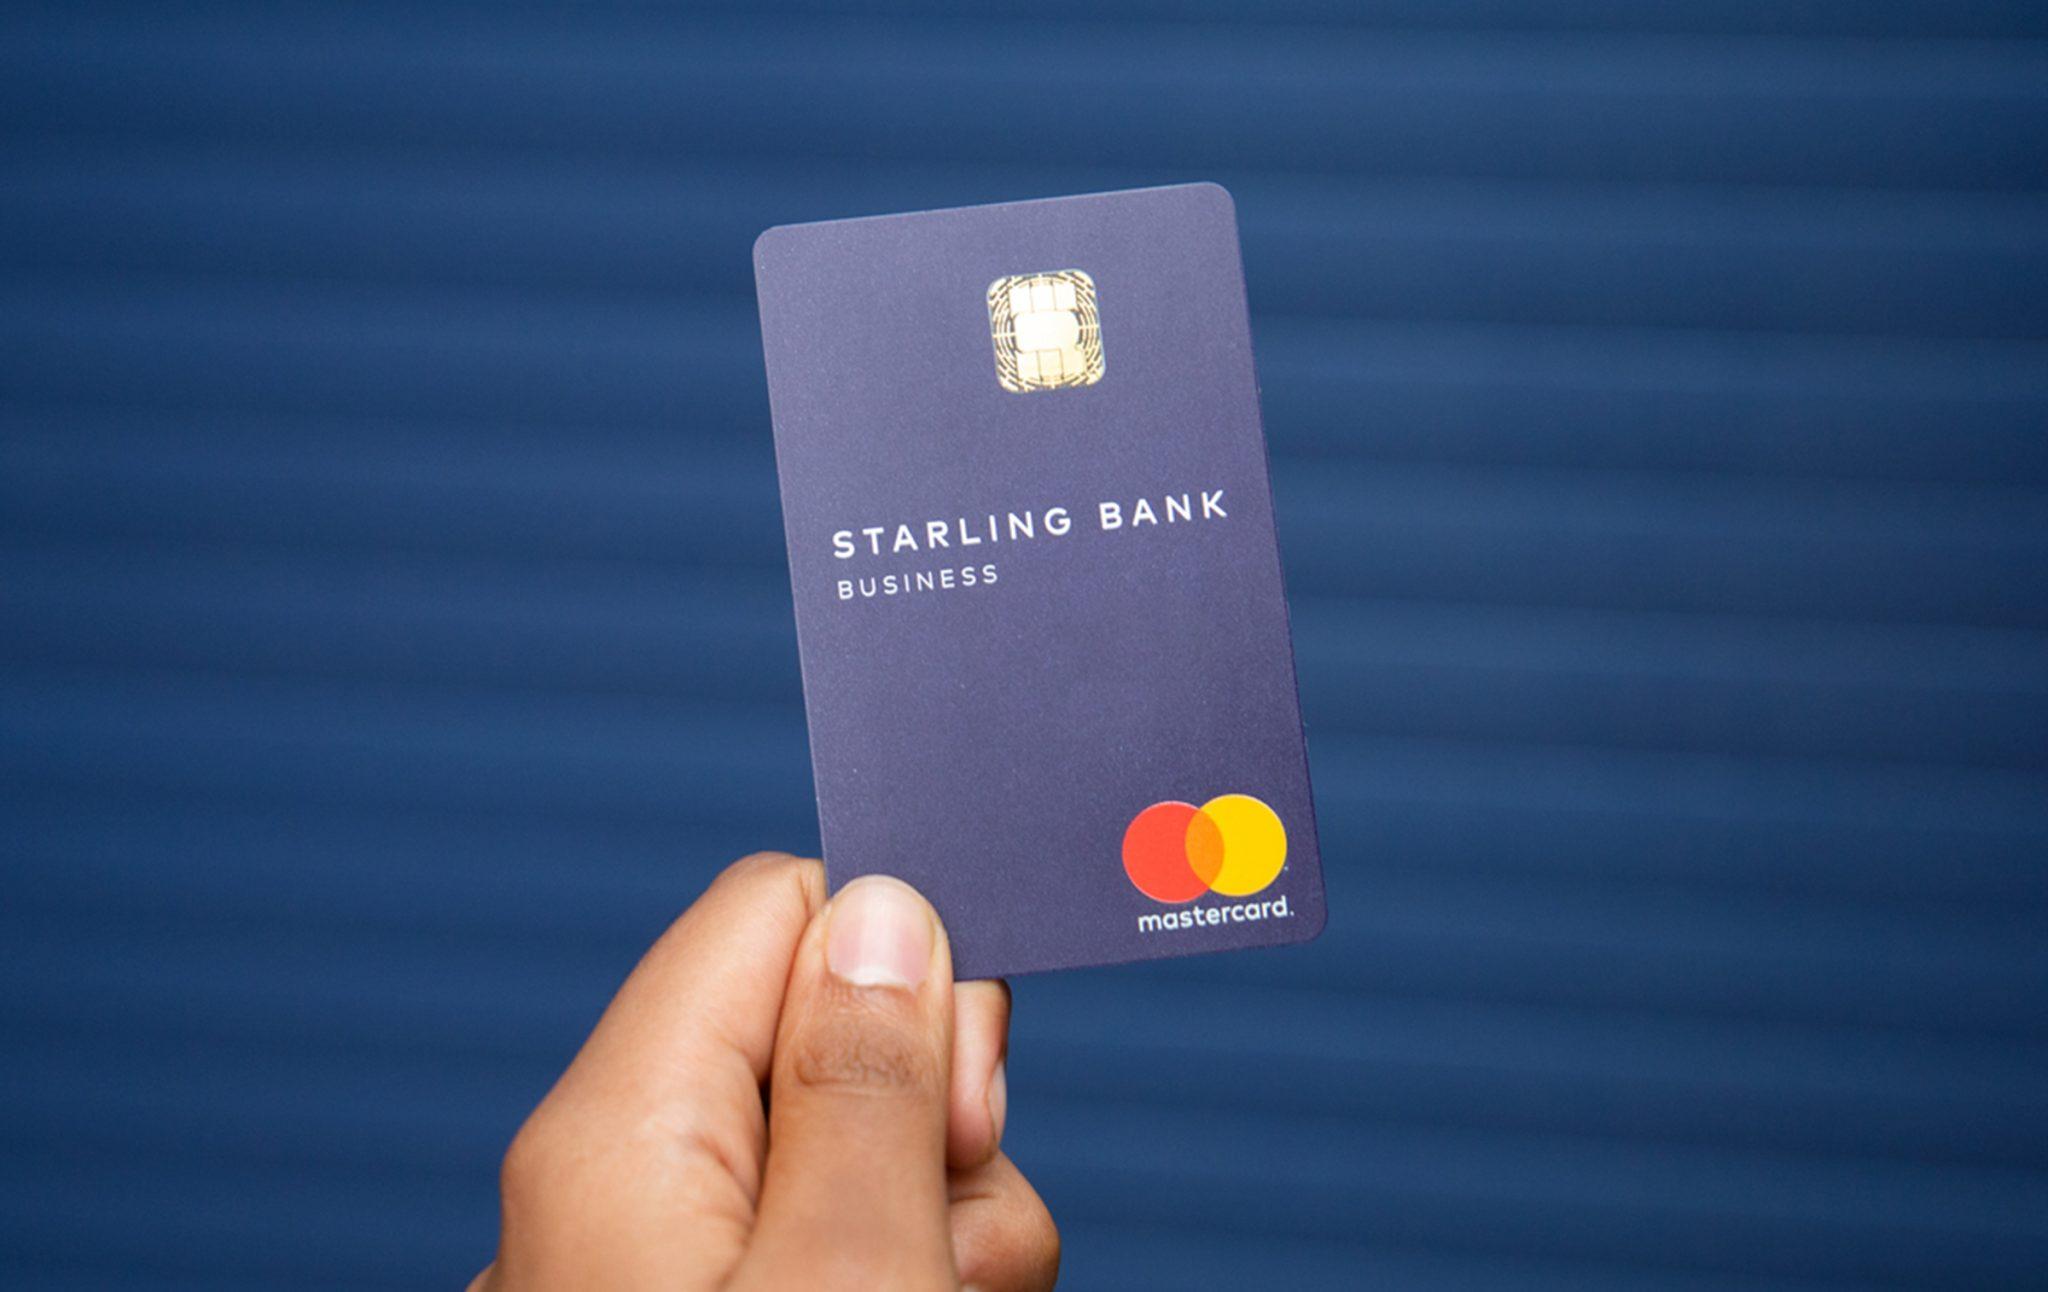 Business StarlingBank A 6